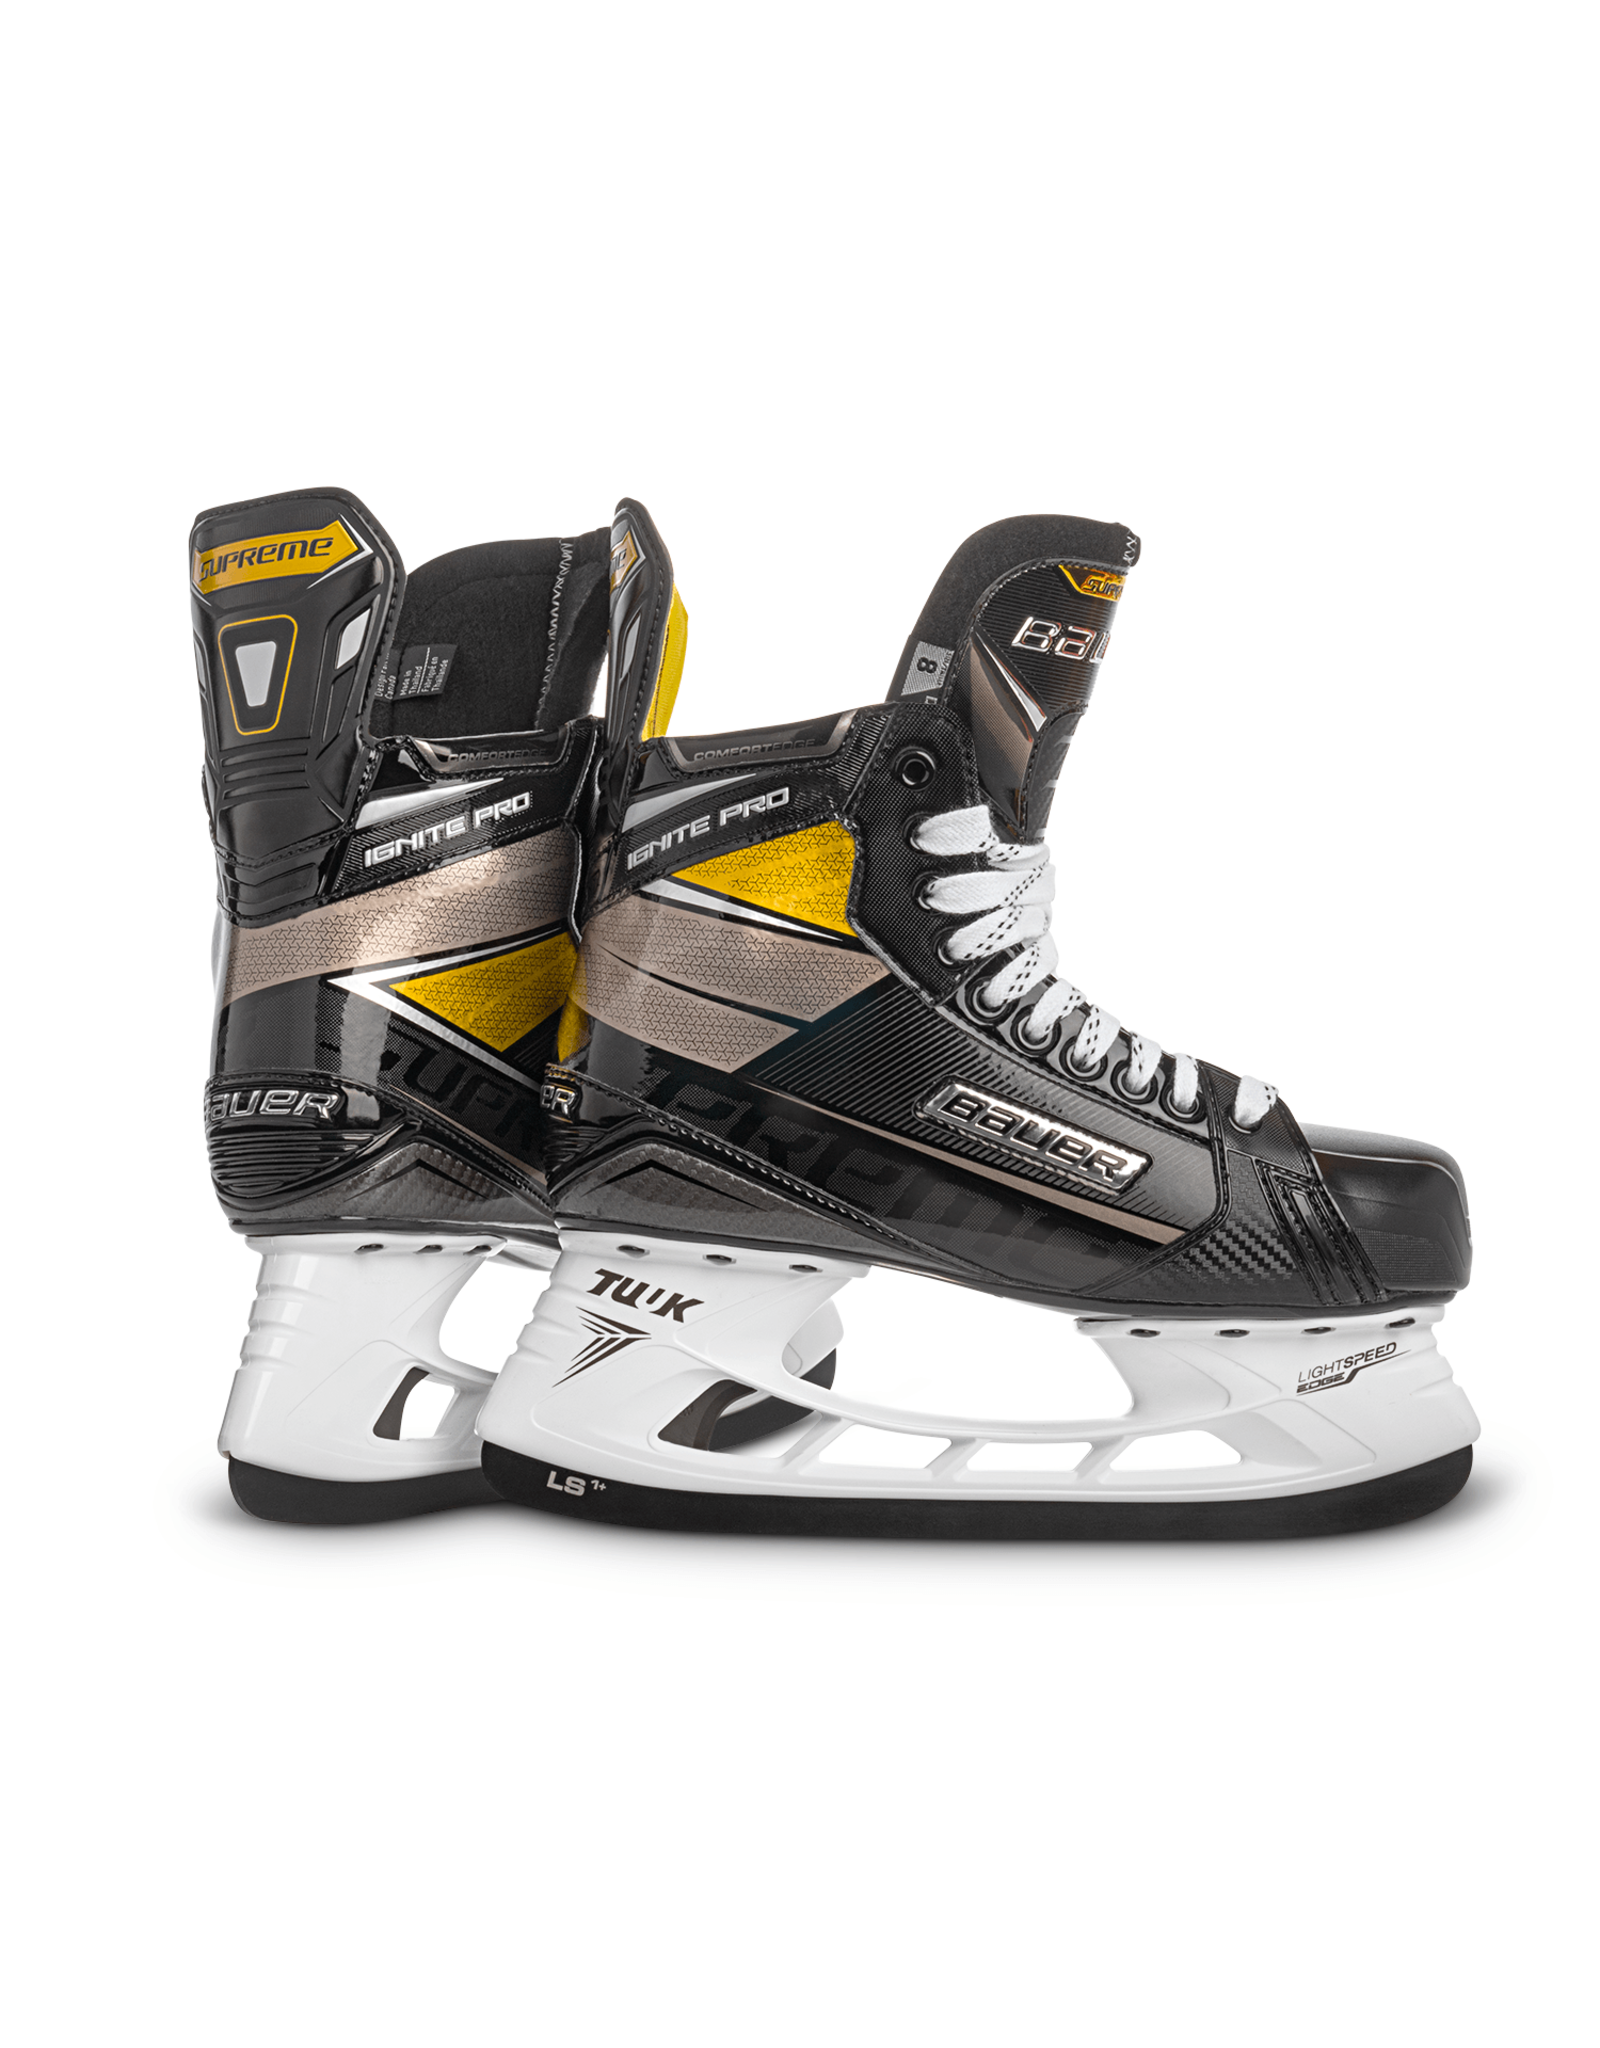 Bauer Hockey - Canada BAUER BTH20 SUPREME IGNITE PRO SKATE SR